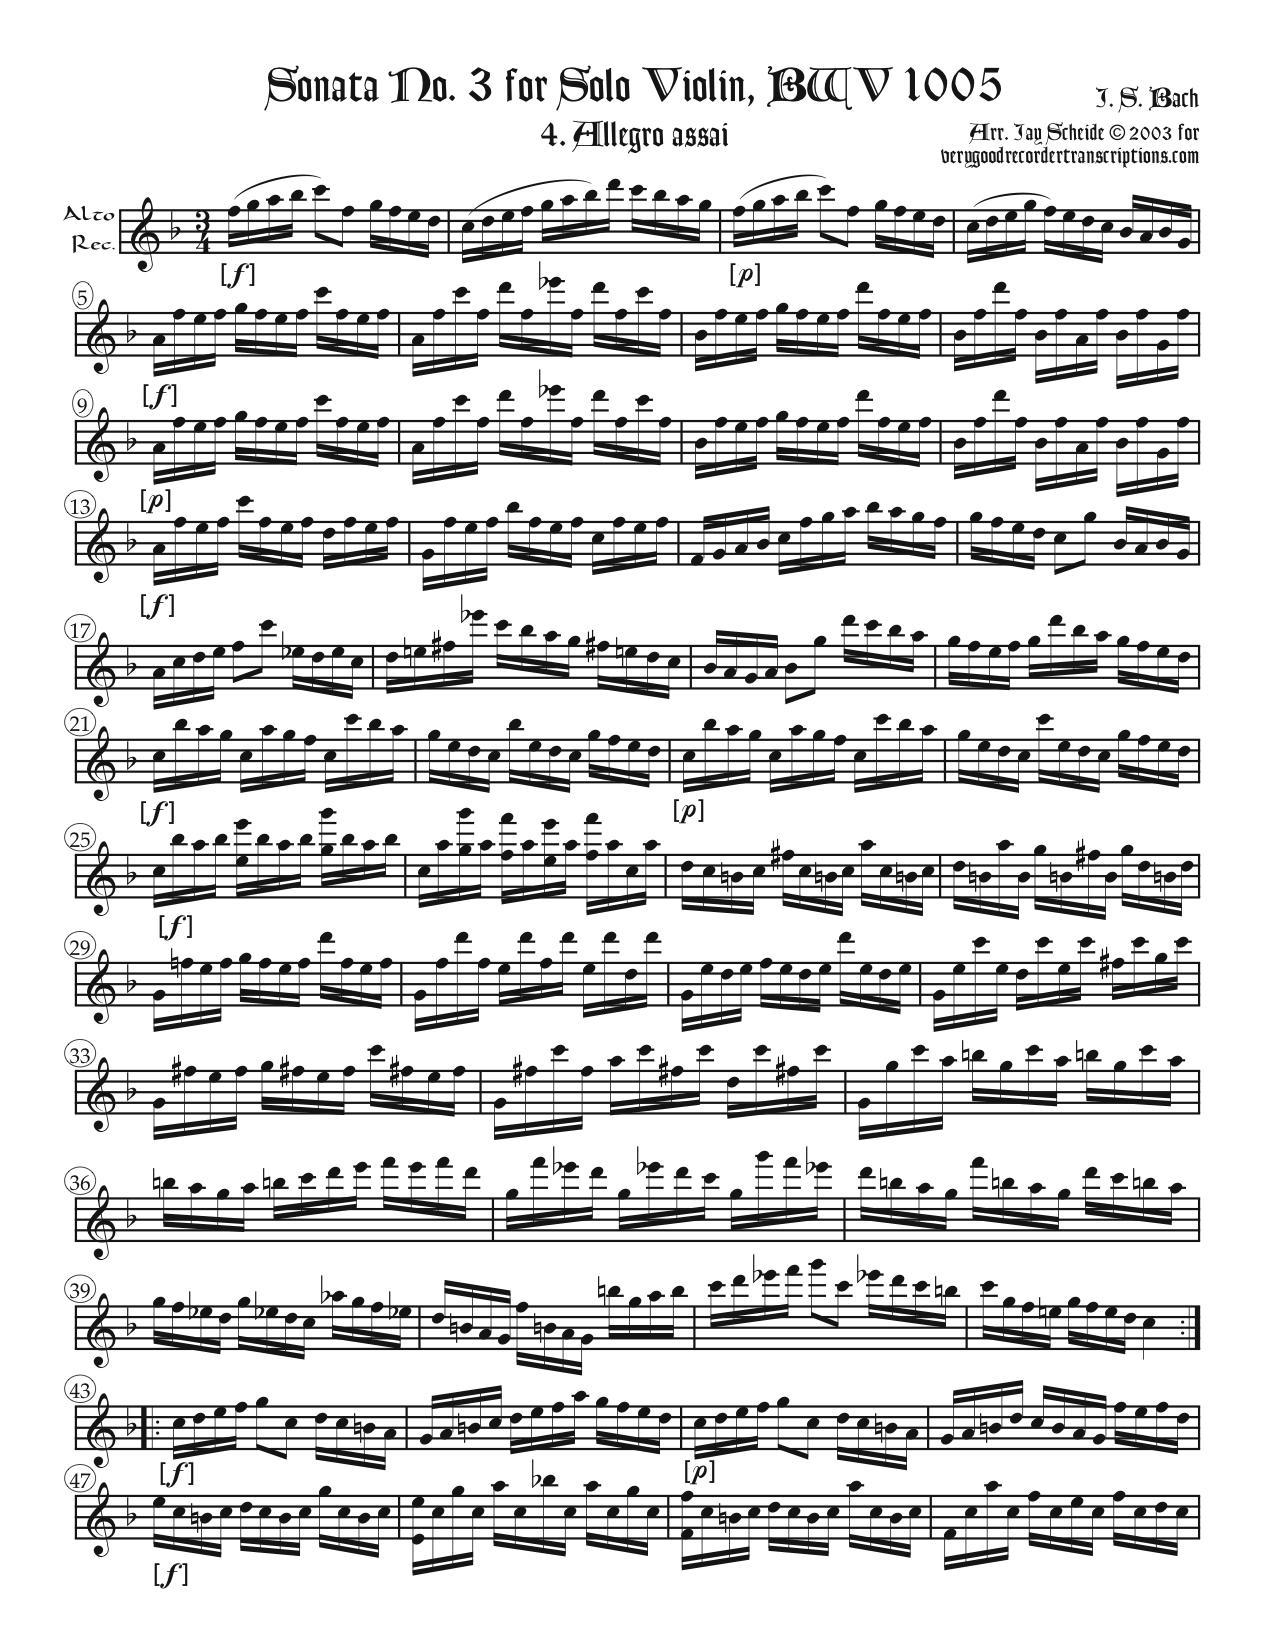 Allegro assai from Sonata No. 3, BWV 1005